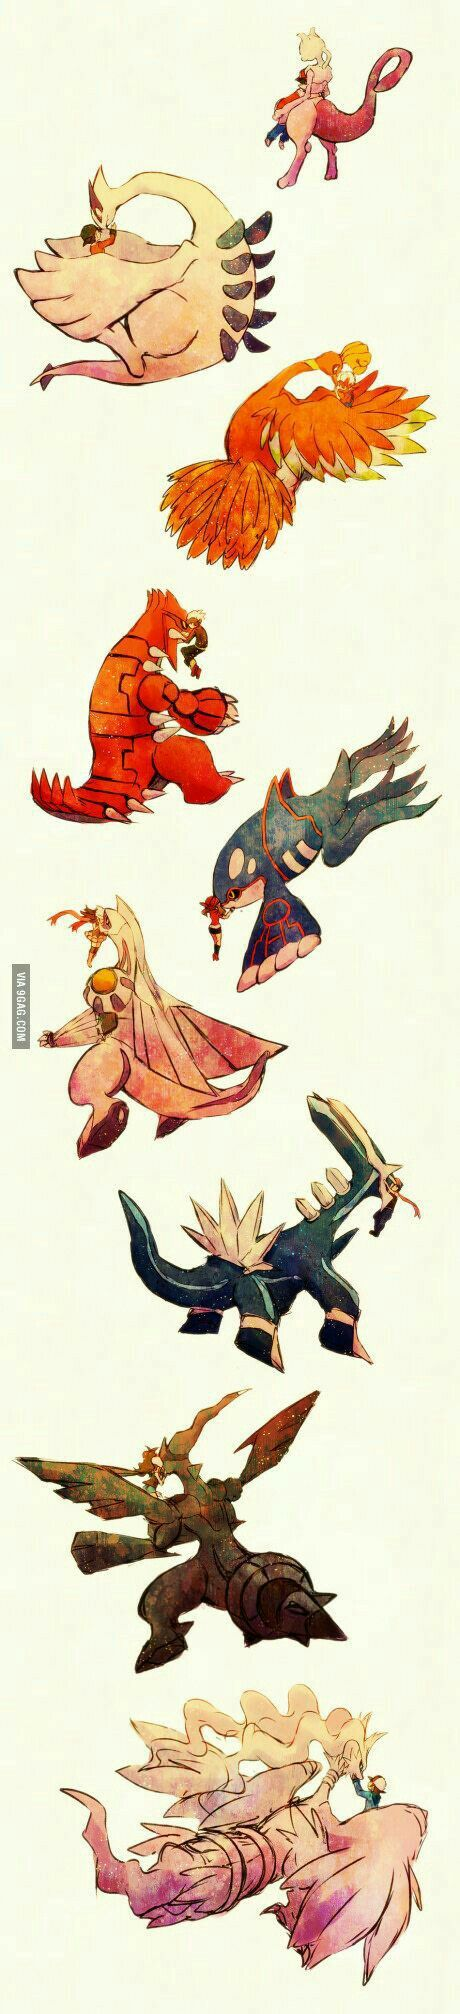 Mewtwo, Lugia, Ho-oh, Groudon, Kyogre, Palkia, Dialga, Zekrom, Reshiram, Trainers, Legendary Pokémon; Pokémon